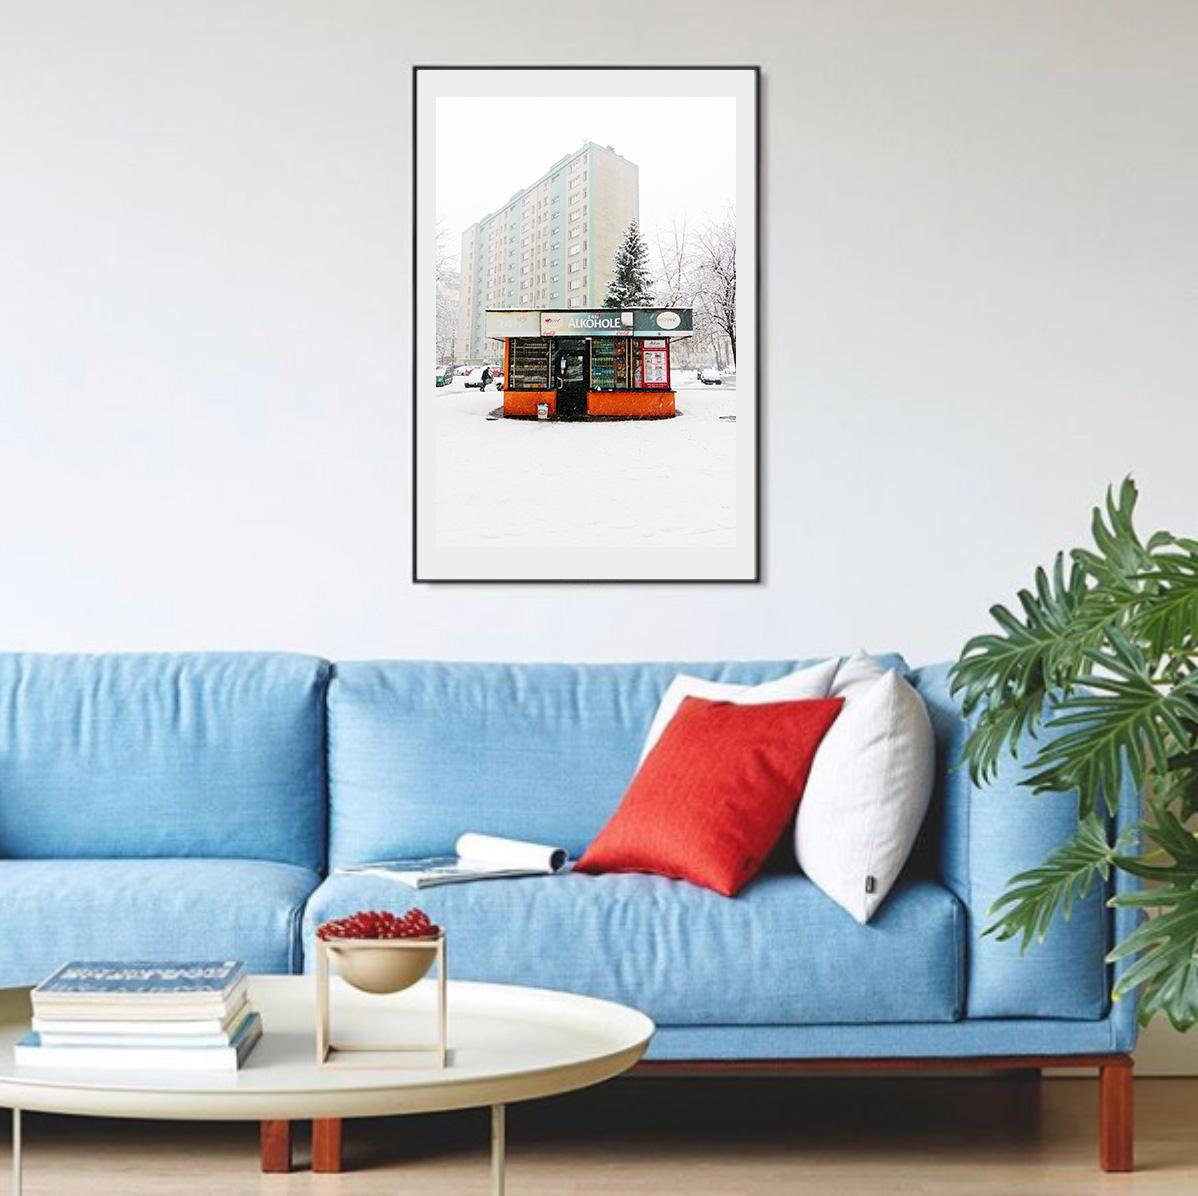 socilaist modernism poster photography